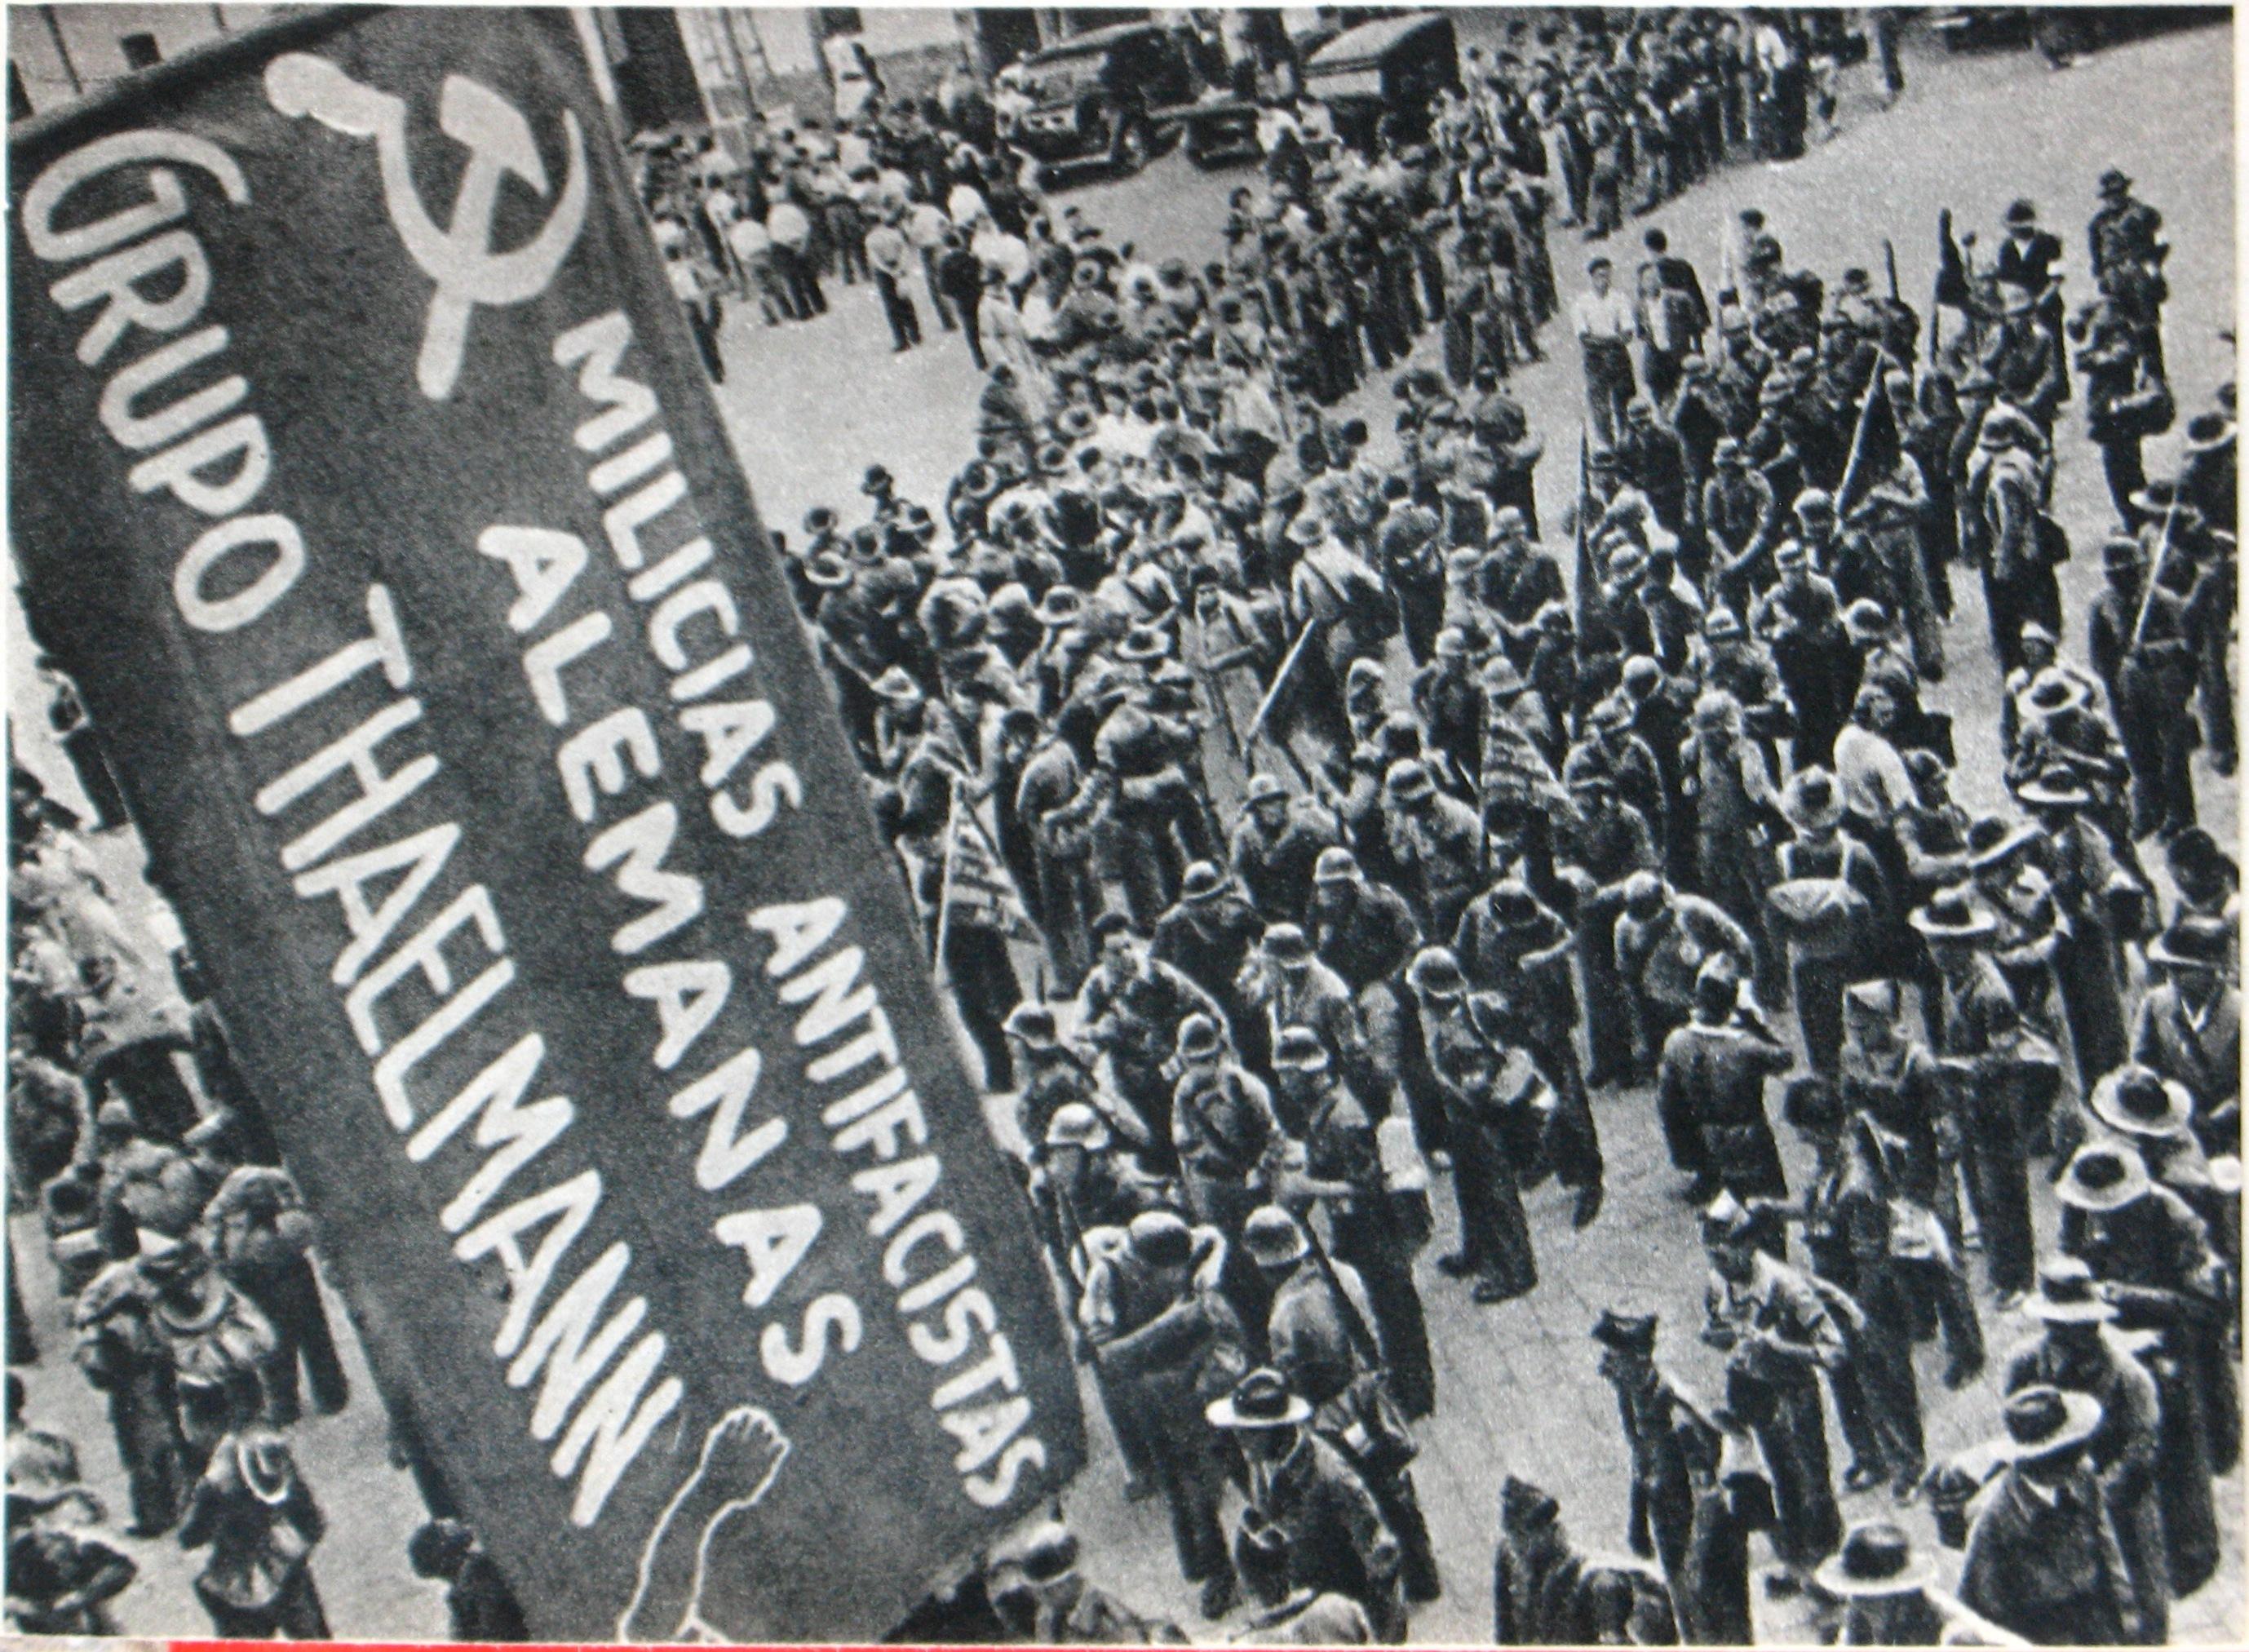 Soldiers of the Thälmann Battalion in Spain, c.1938. Mikhail Koltsov. Public Domain.